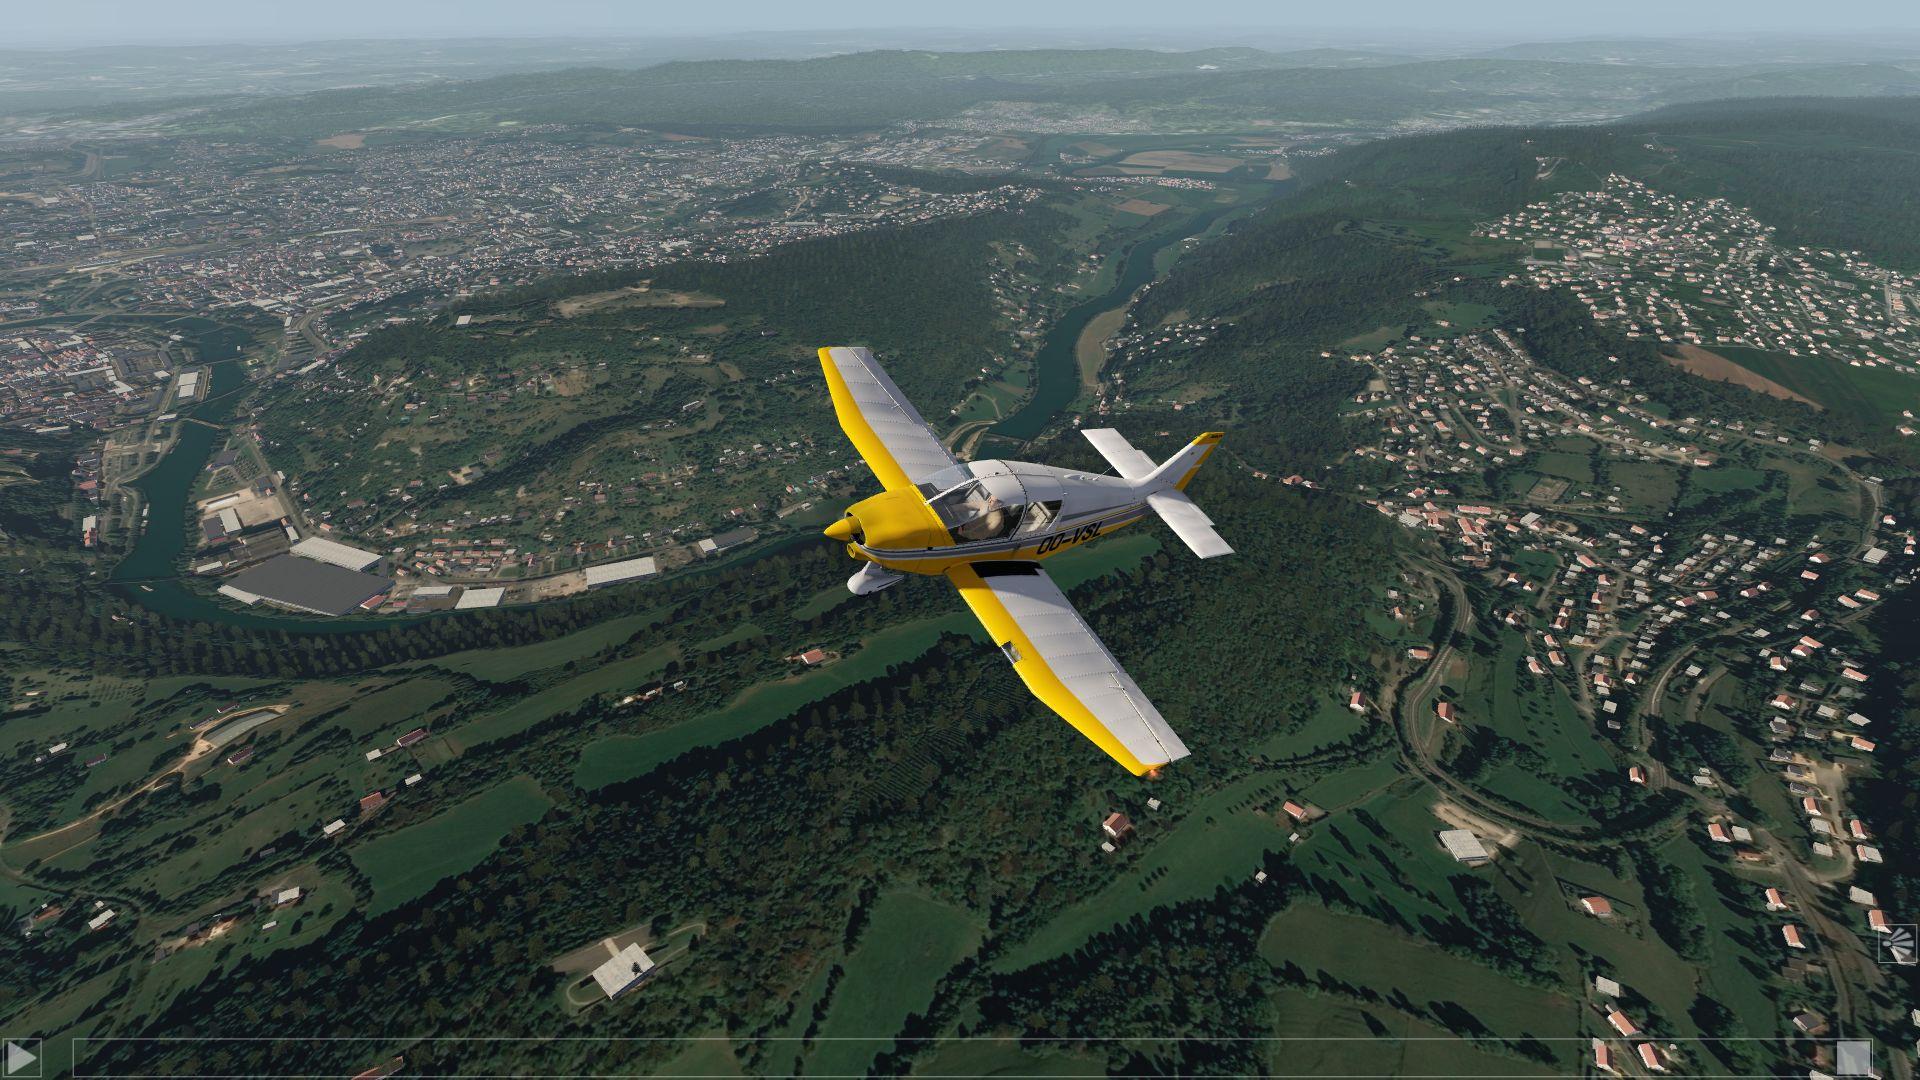 http://www.pilote-virtuel.com/img/gallery/1517173427.jpg